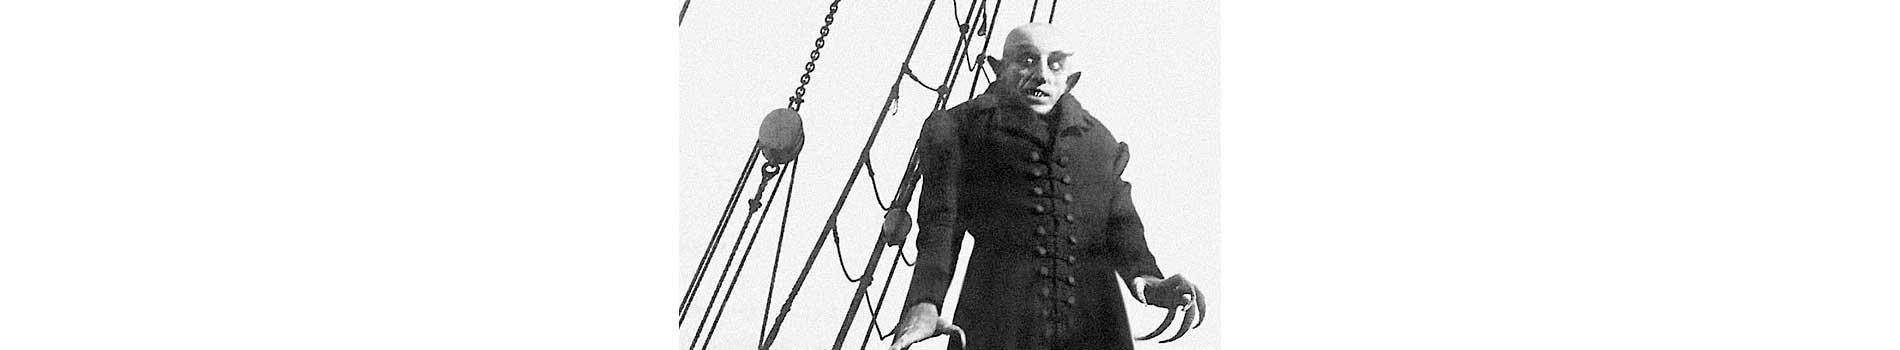 Nosferatu-slider